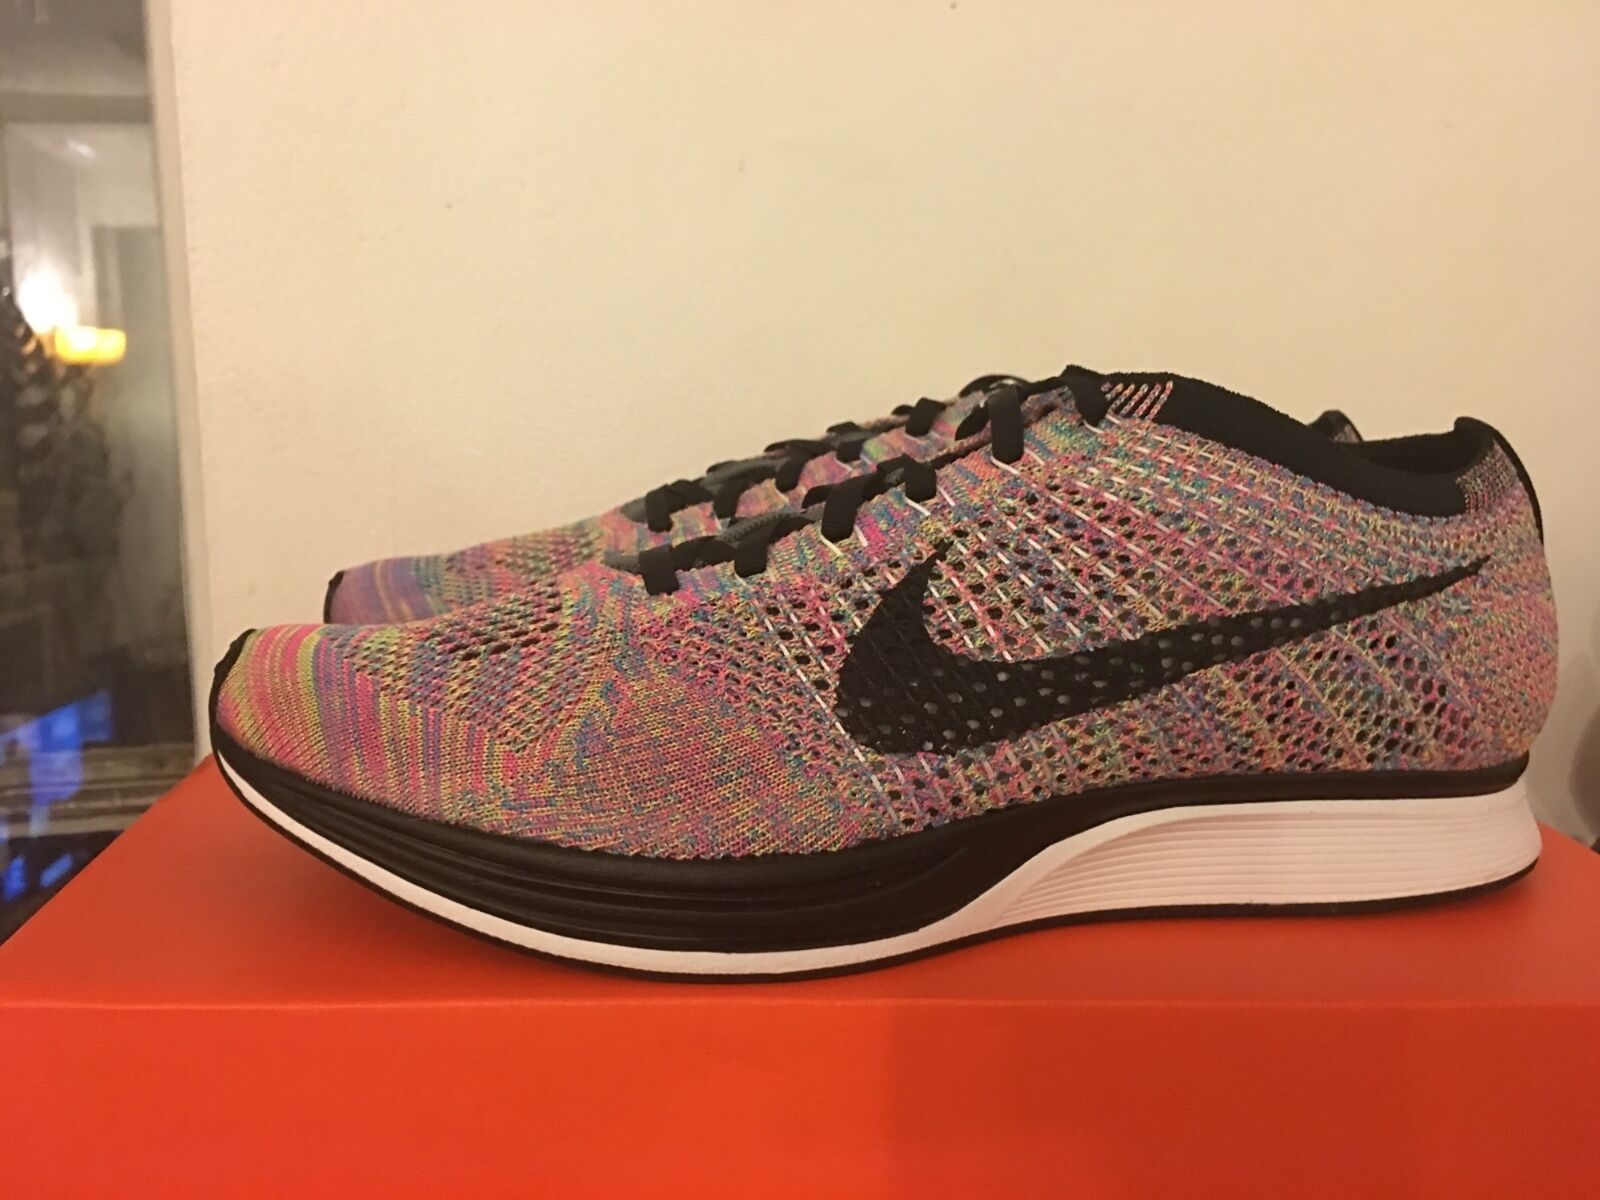 Nike Flyknit Racer Multicolor Rainbow Dark Grey/Black/Blue Glow/Pink 526628-004